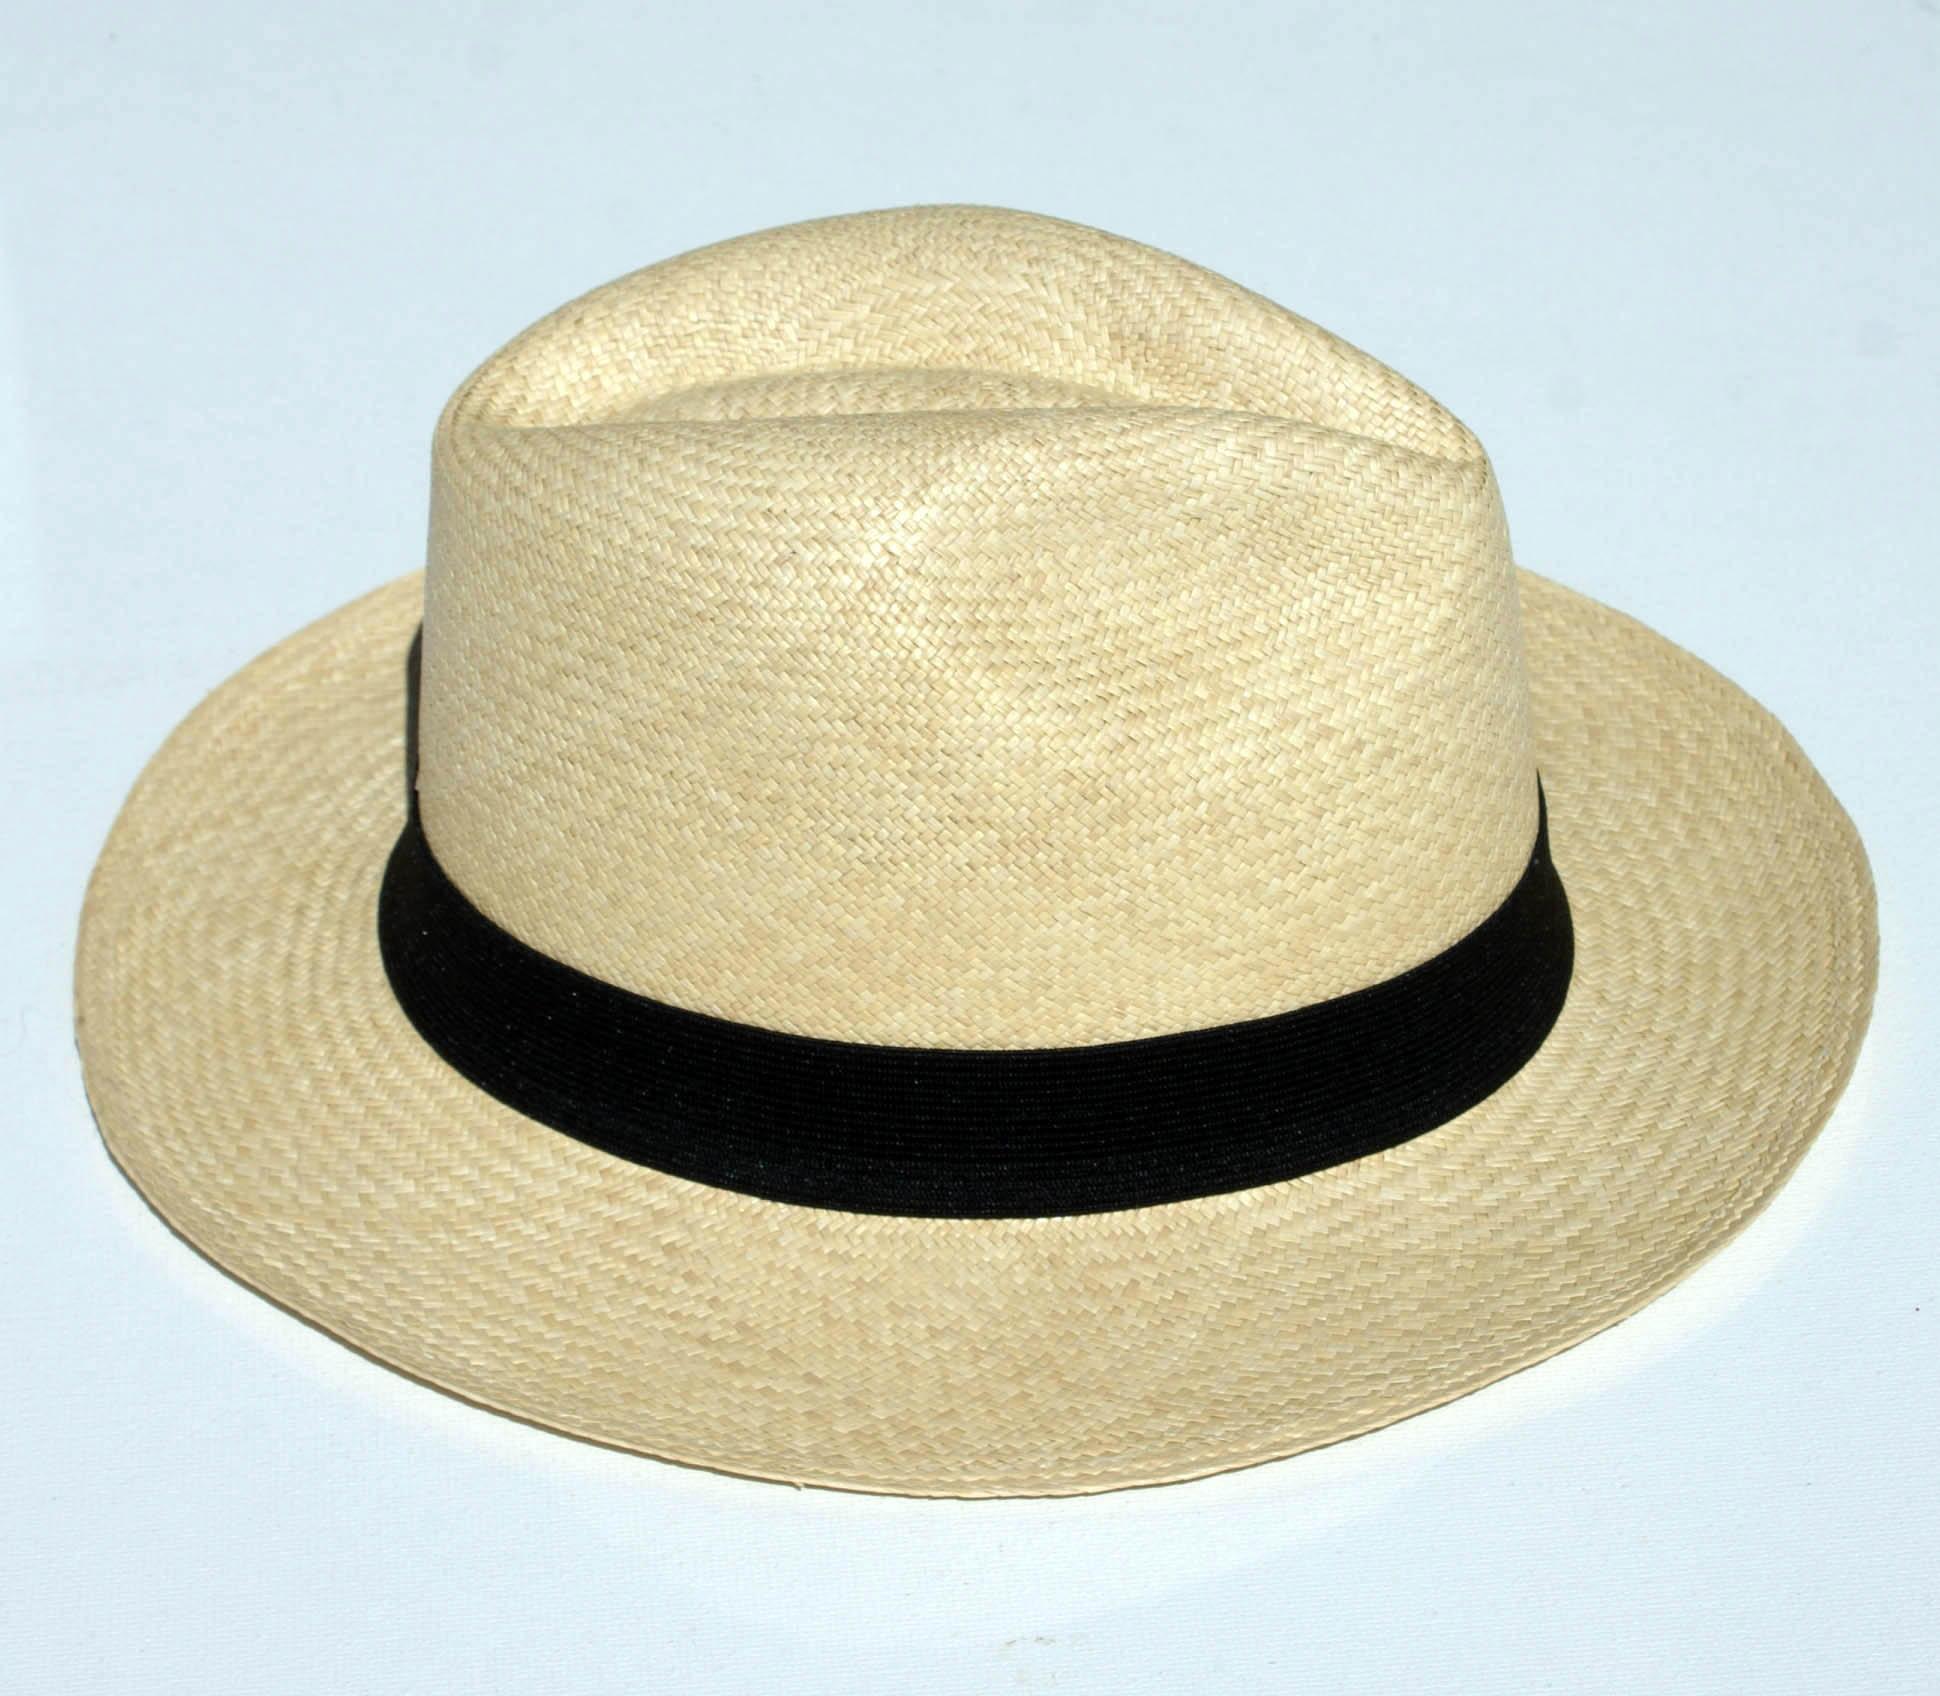 Sombrero De Paja Toquilla (panamahat) Original Hecho en Montecristi -  Ecuador -  14.00 USD - Subastas c5b598e5fbe